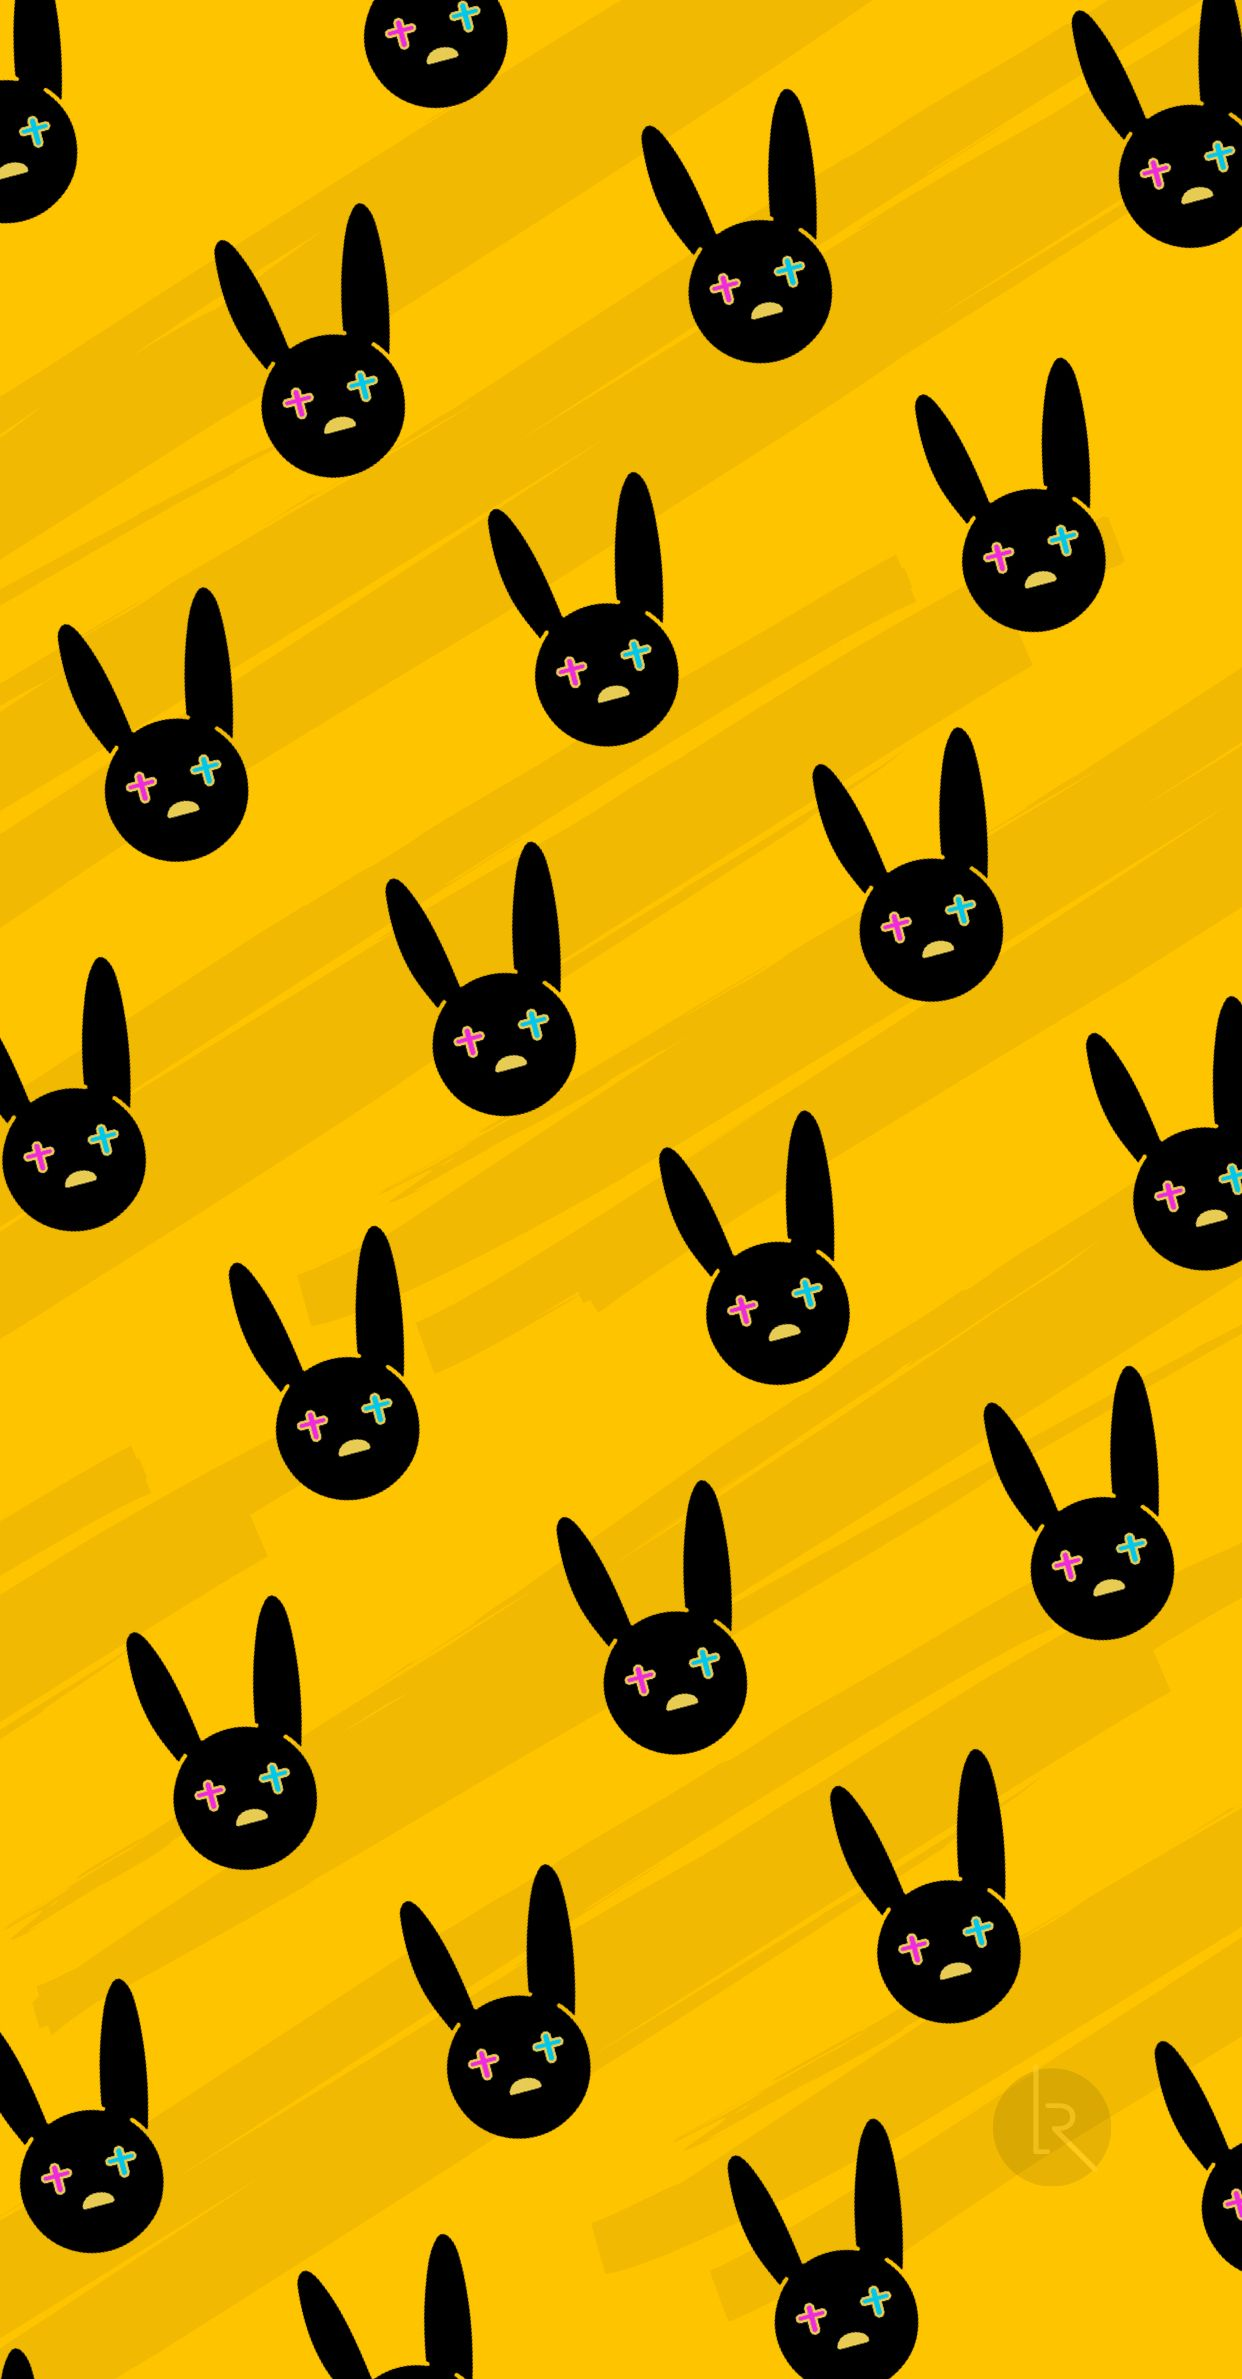 Bad Bunny Logo Wallpaper : bunny, wallpaper, Bunny, Ideas, Bunny,, Wallpaper,